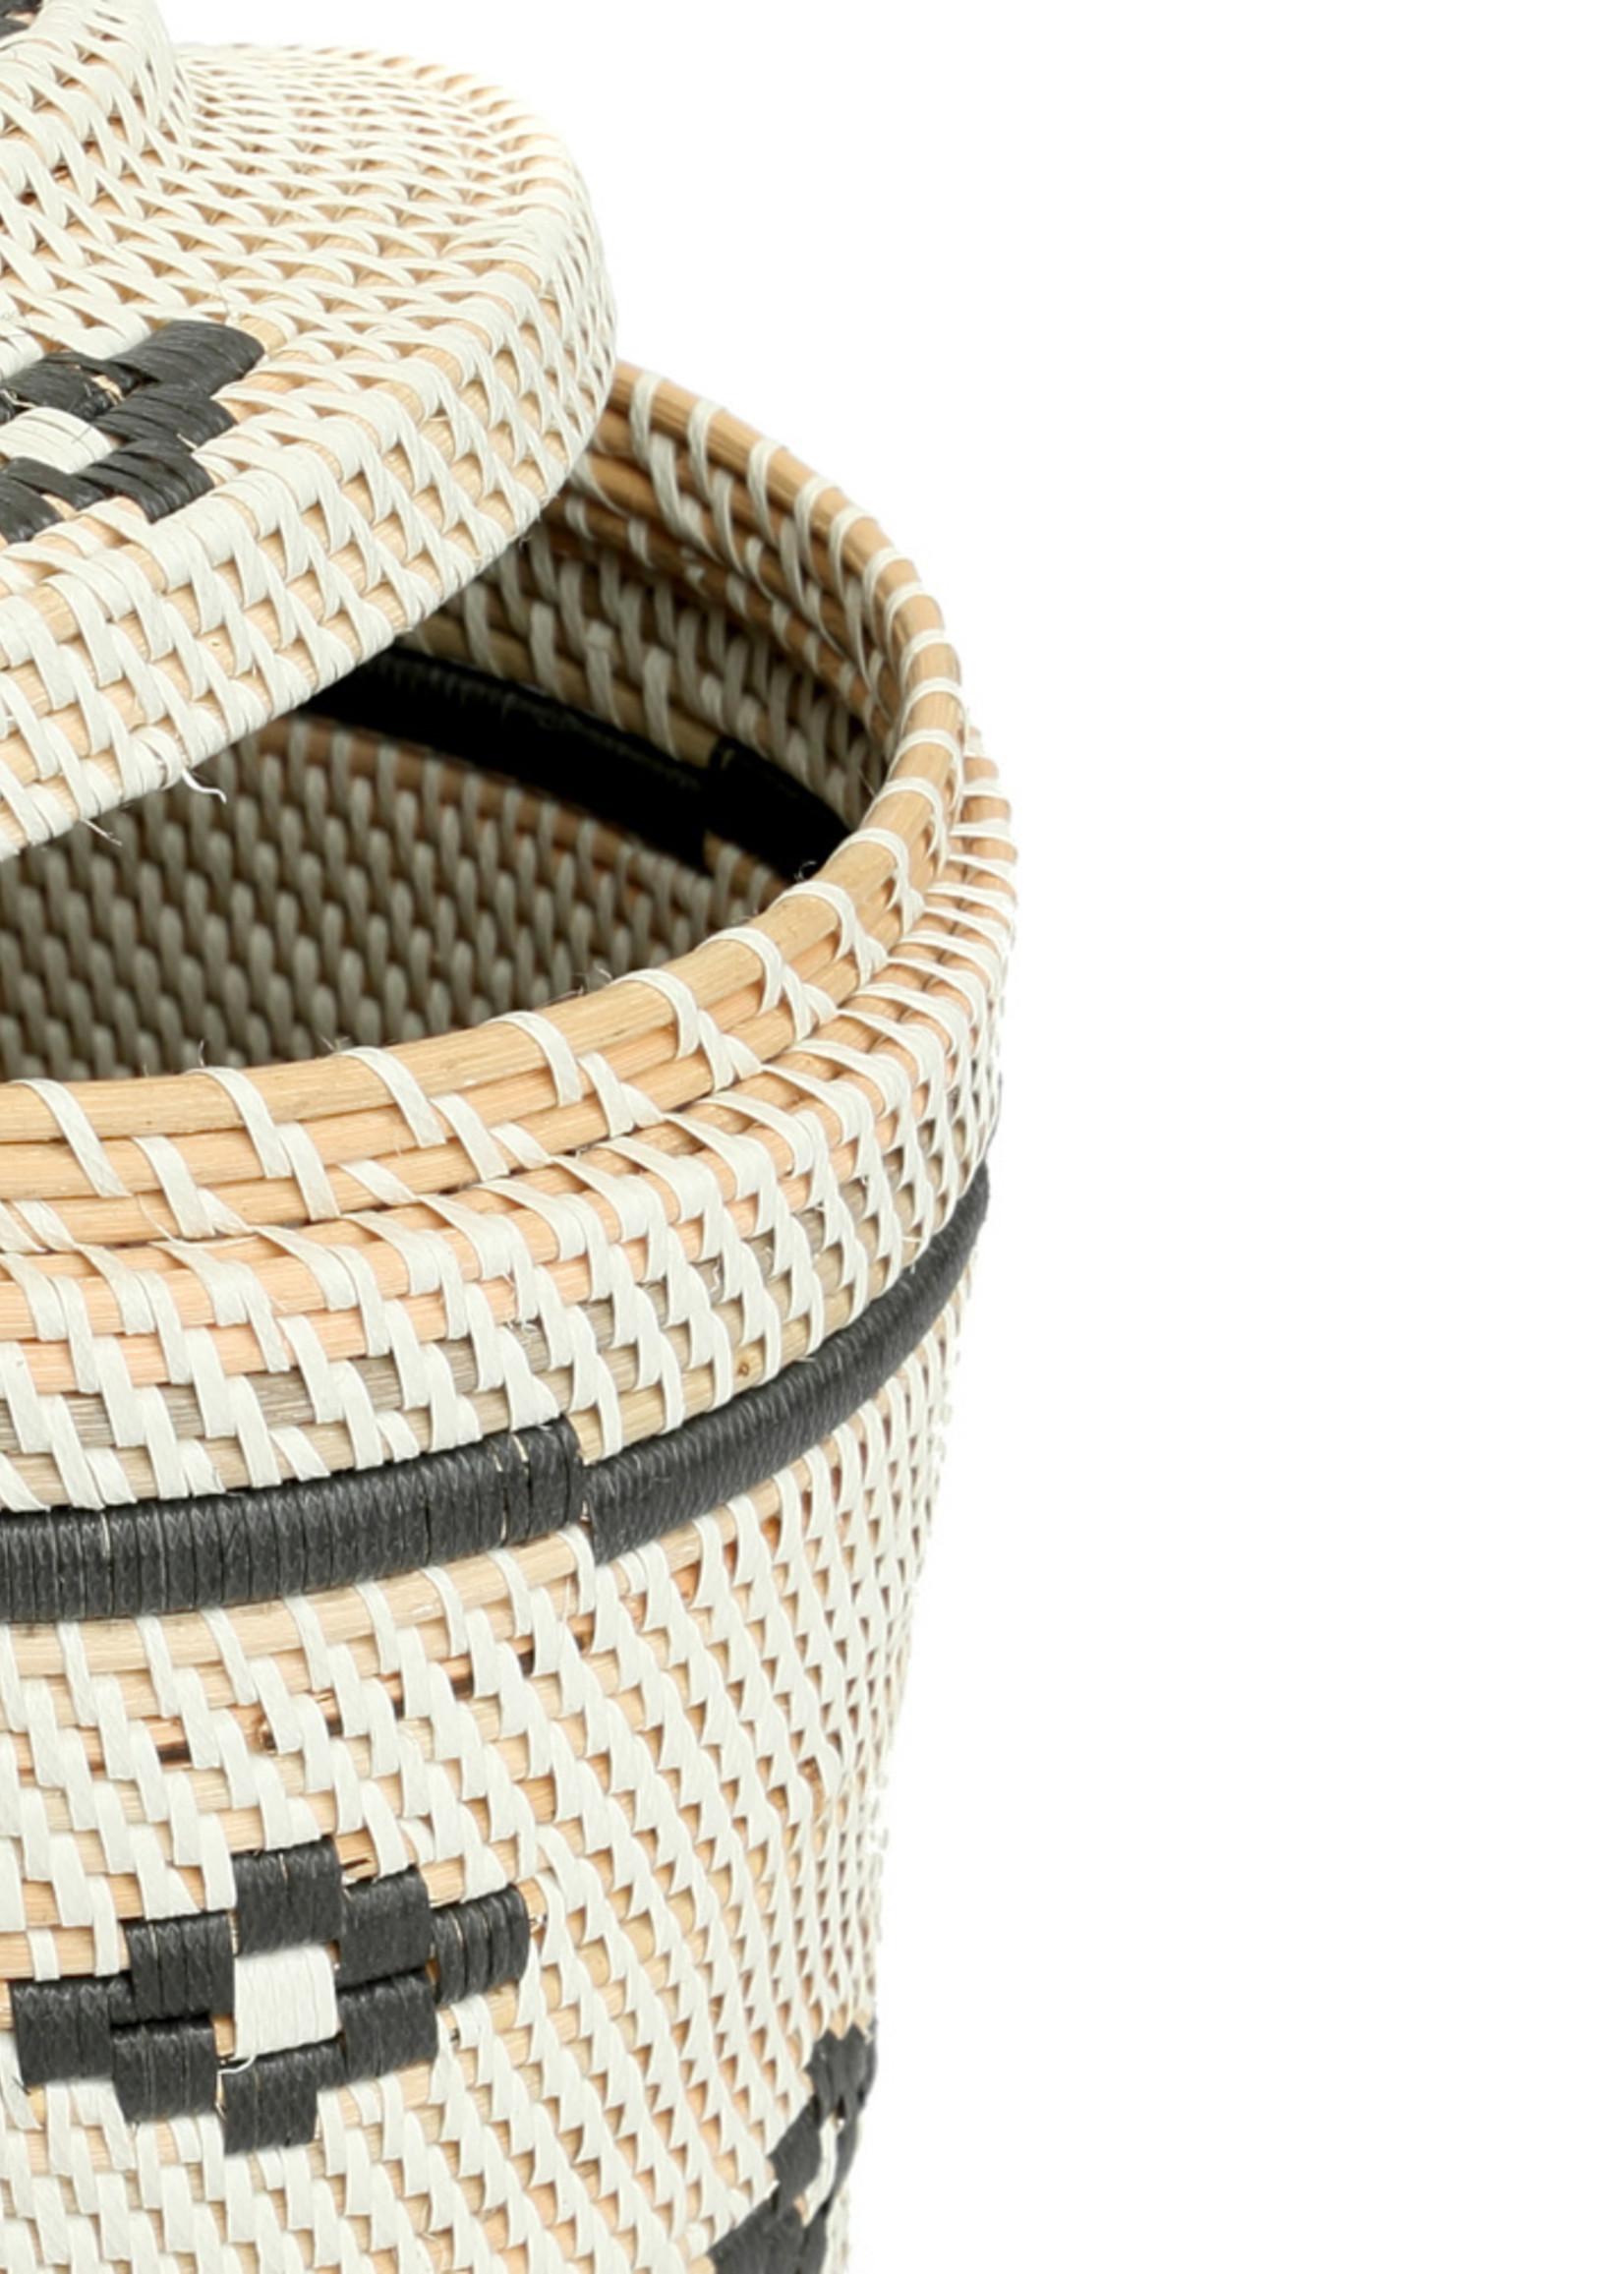 The Crispy Rice Basket - White Black - L